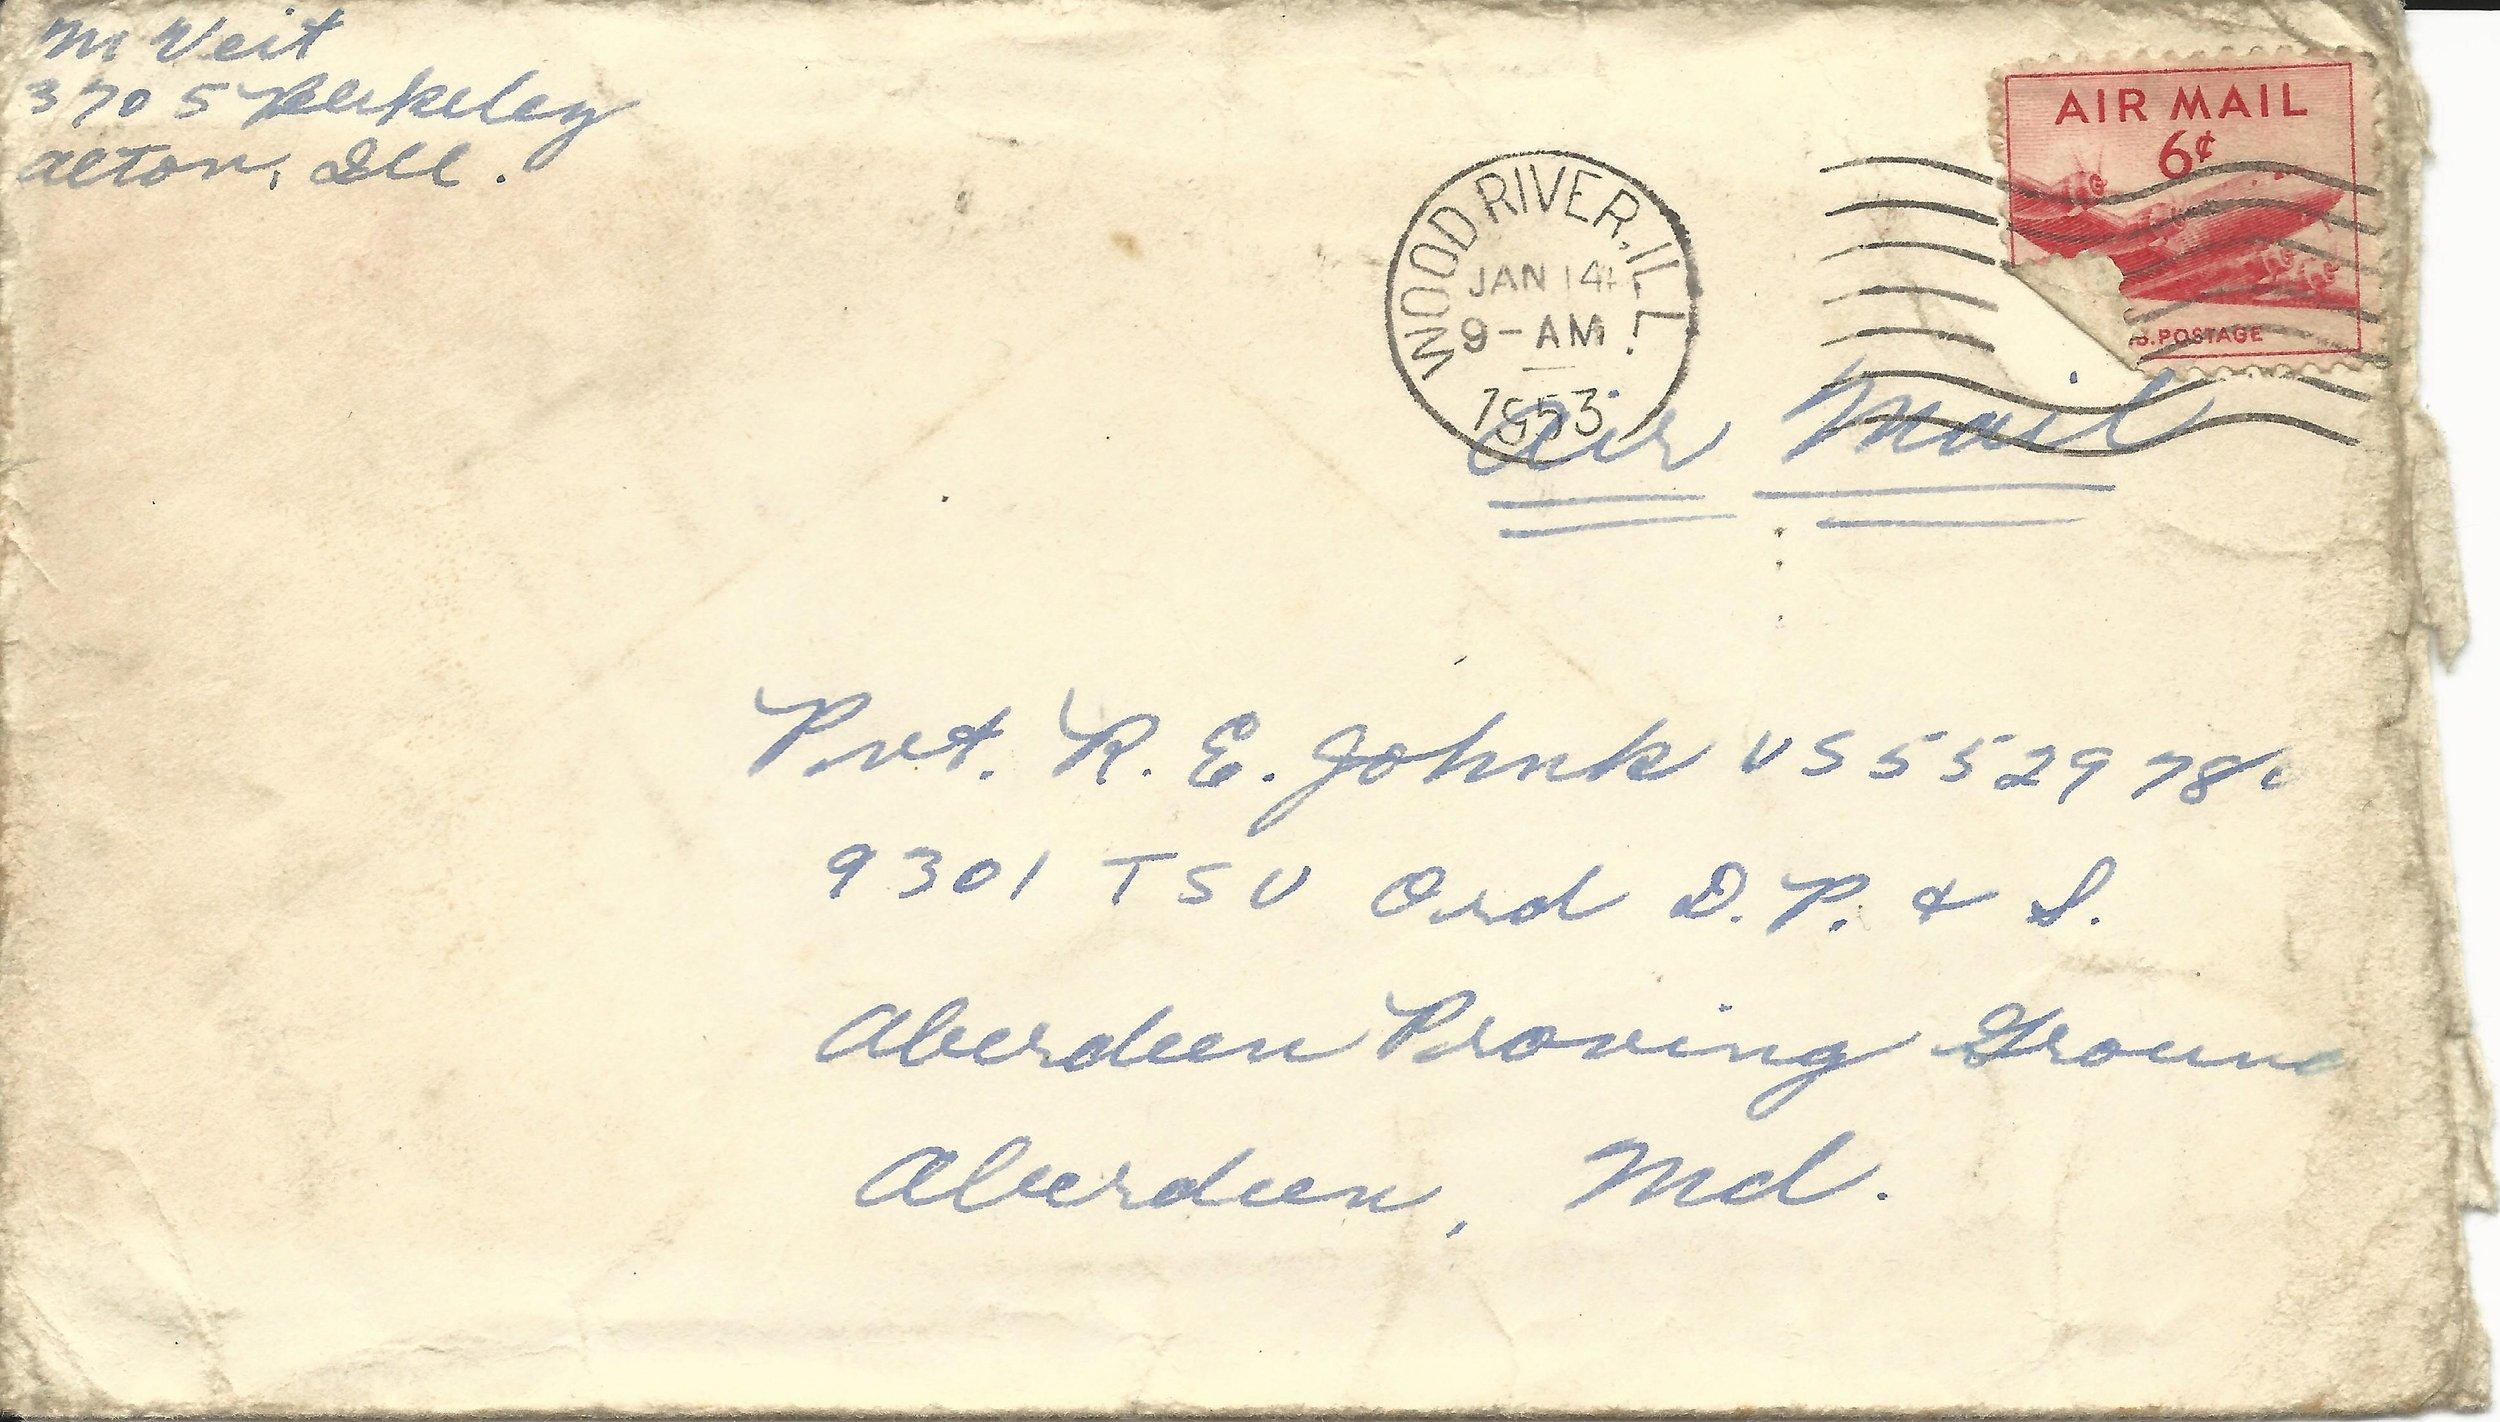 7. Jan. 13, 1953 (Oma)_Page_1.jpg